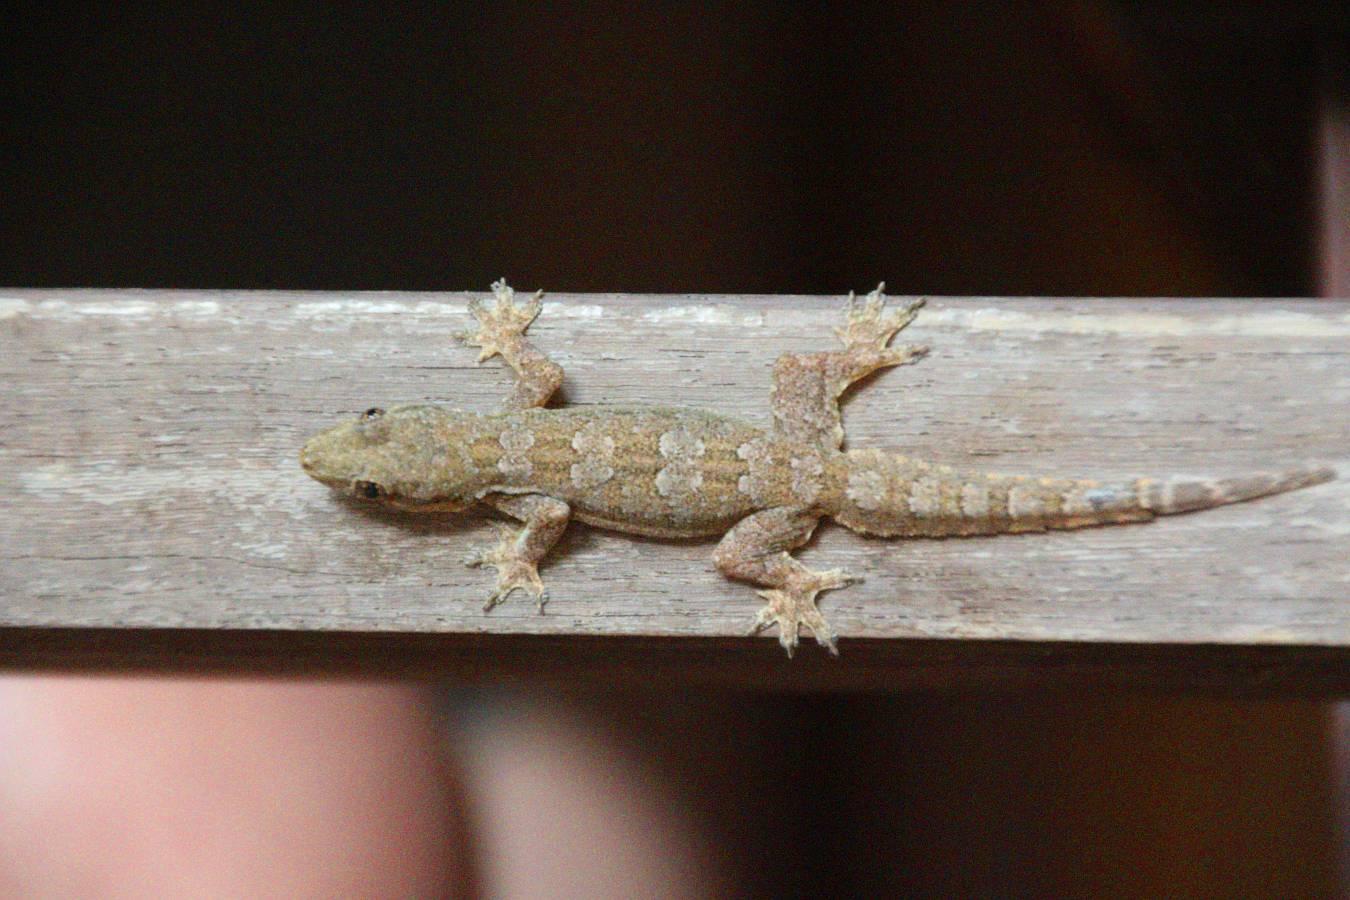 Laos, Vientiane, Gecko